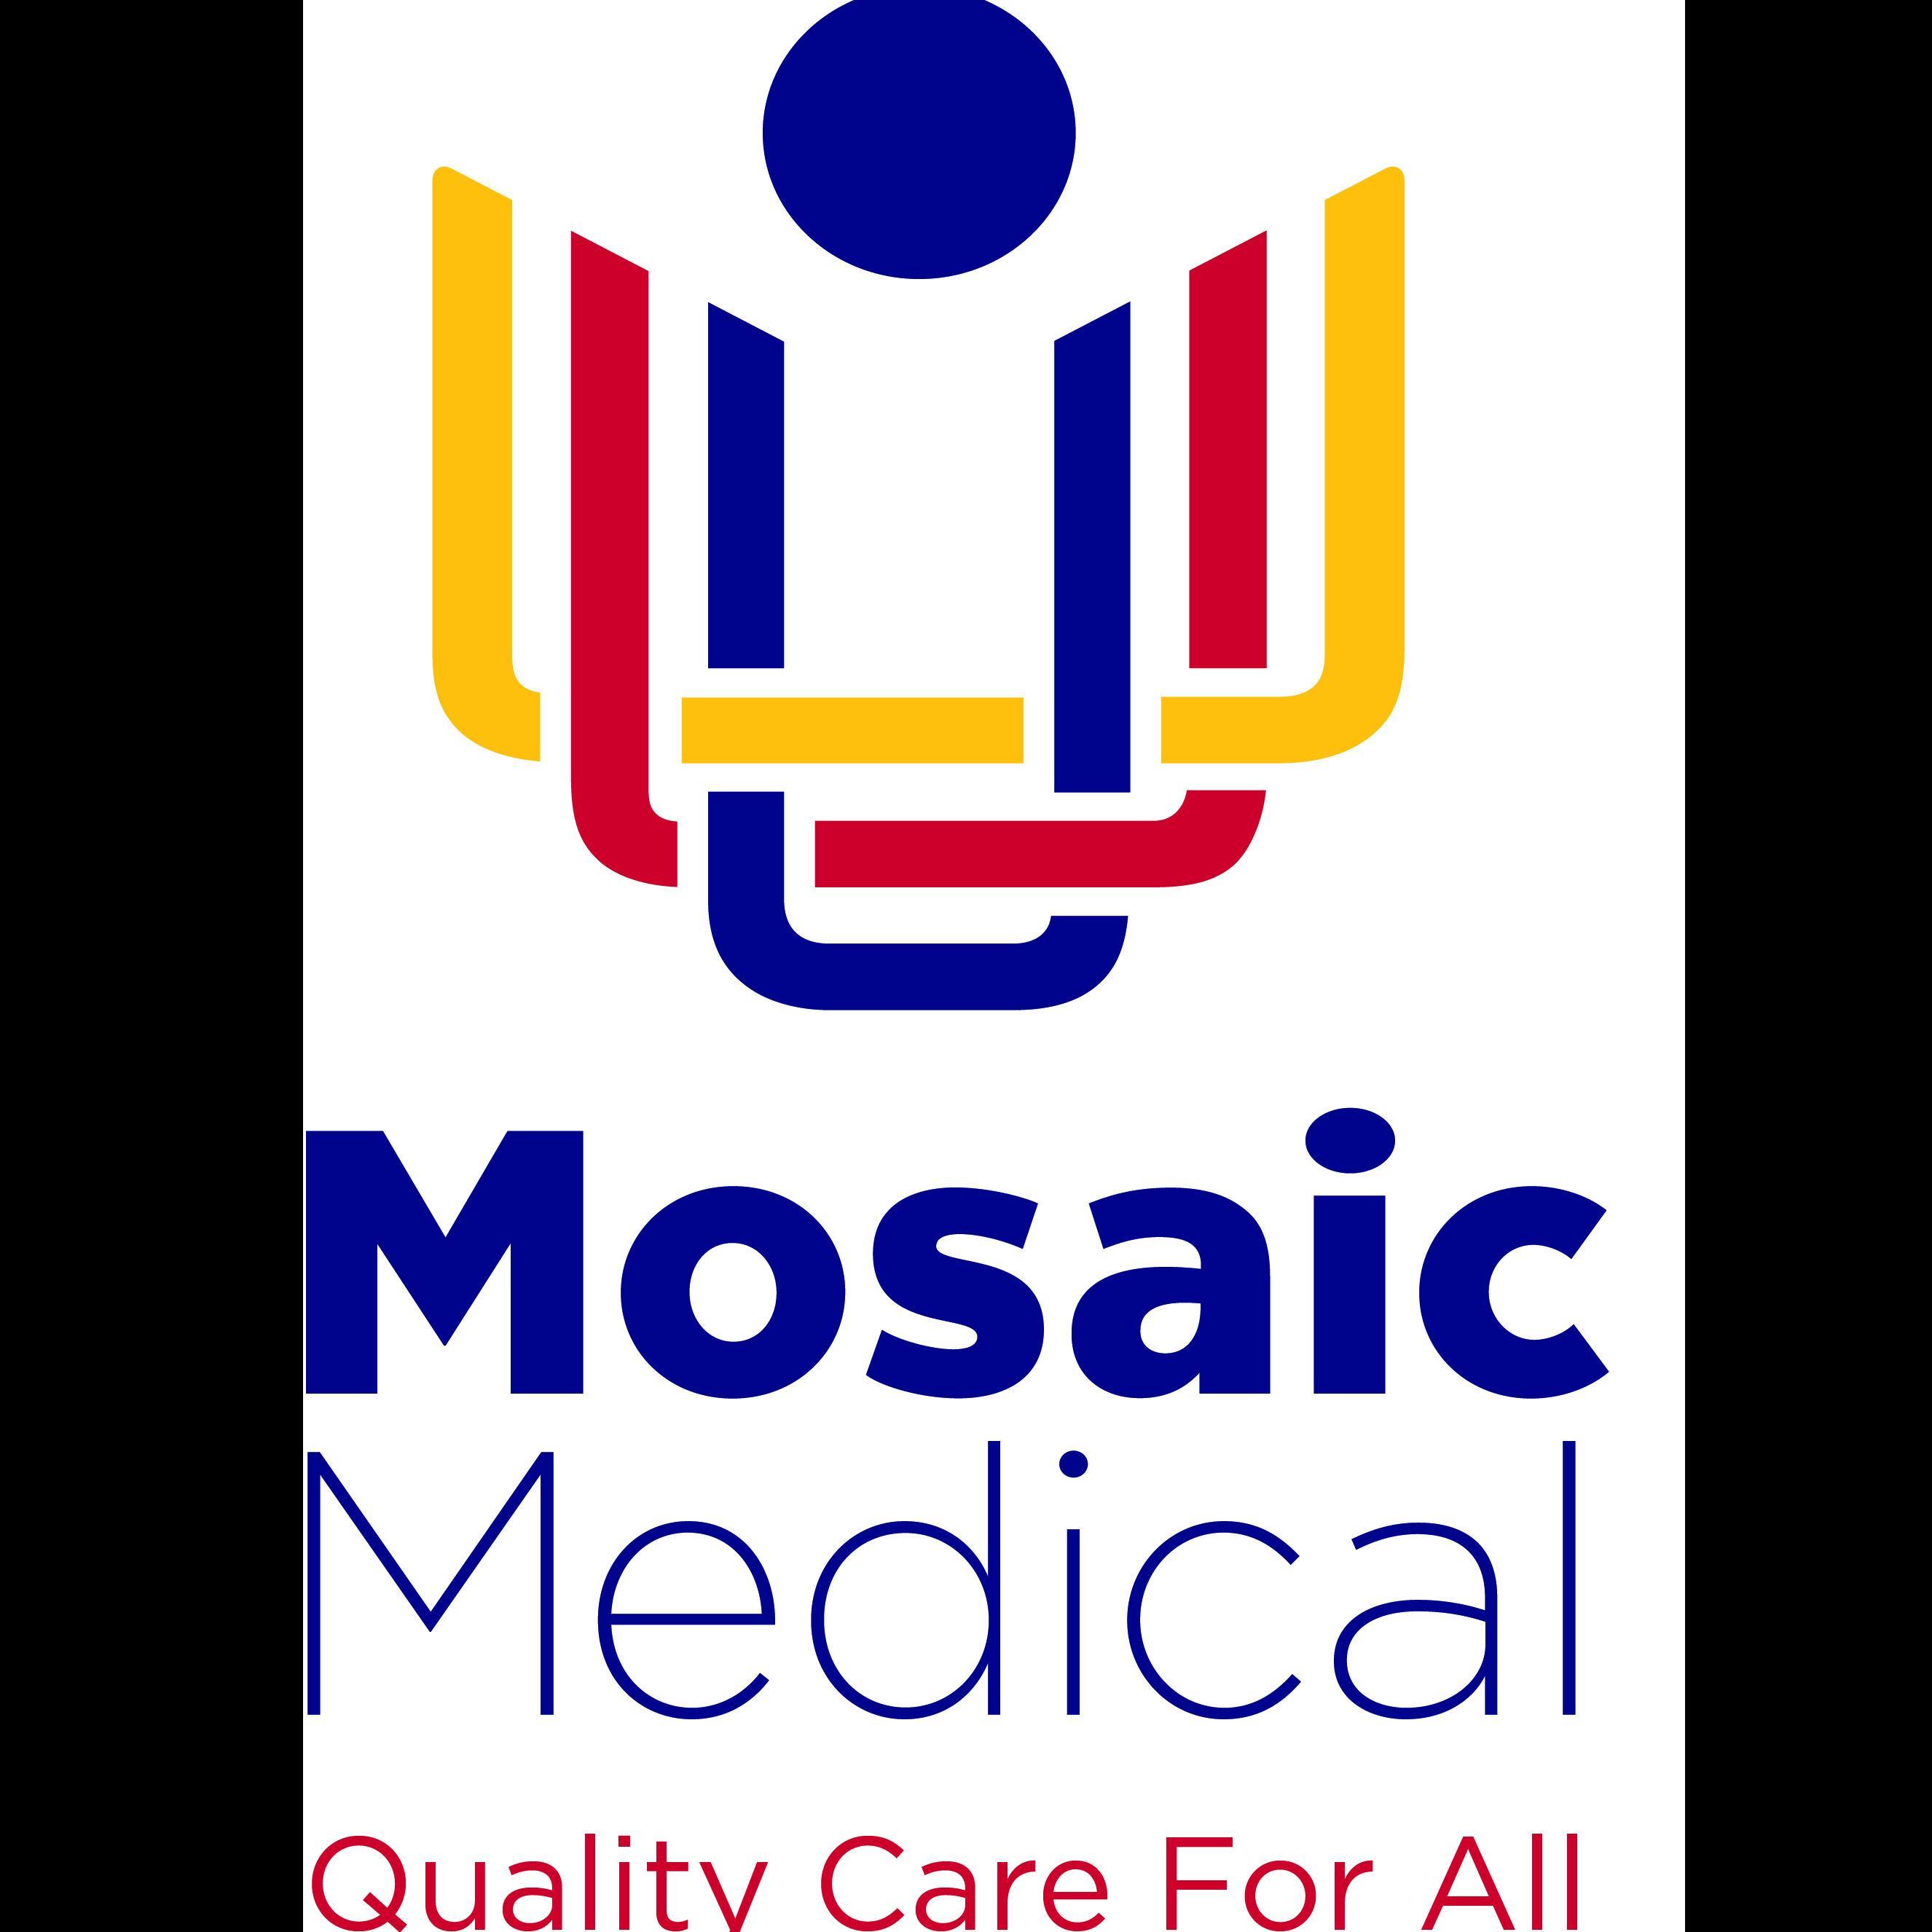 Mosaic Medical East Bend Pediatric